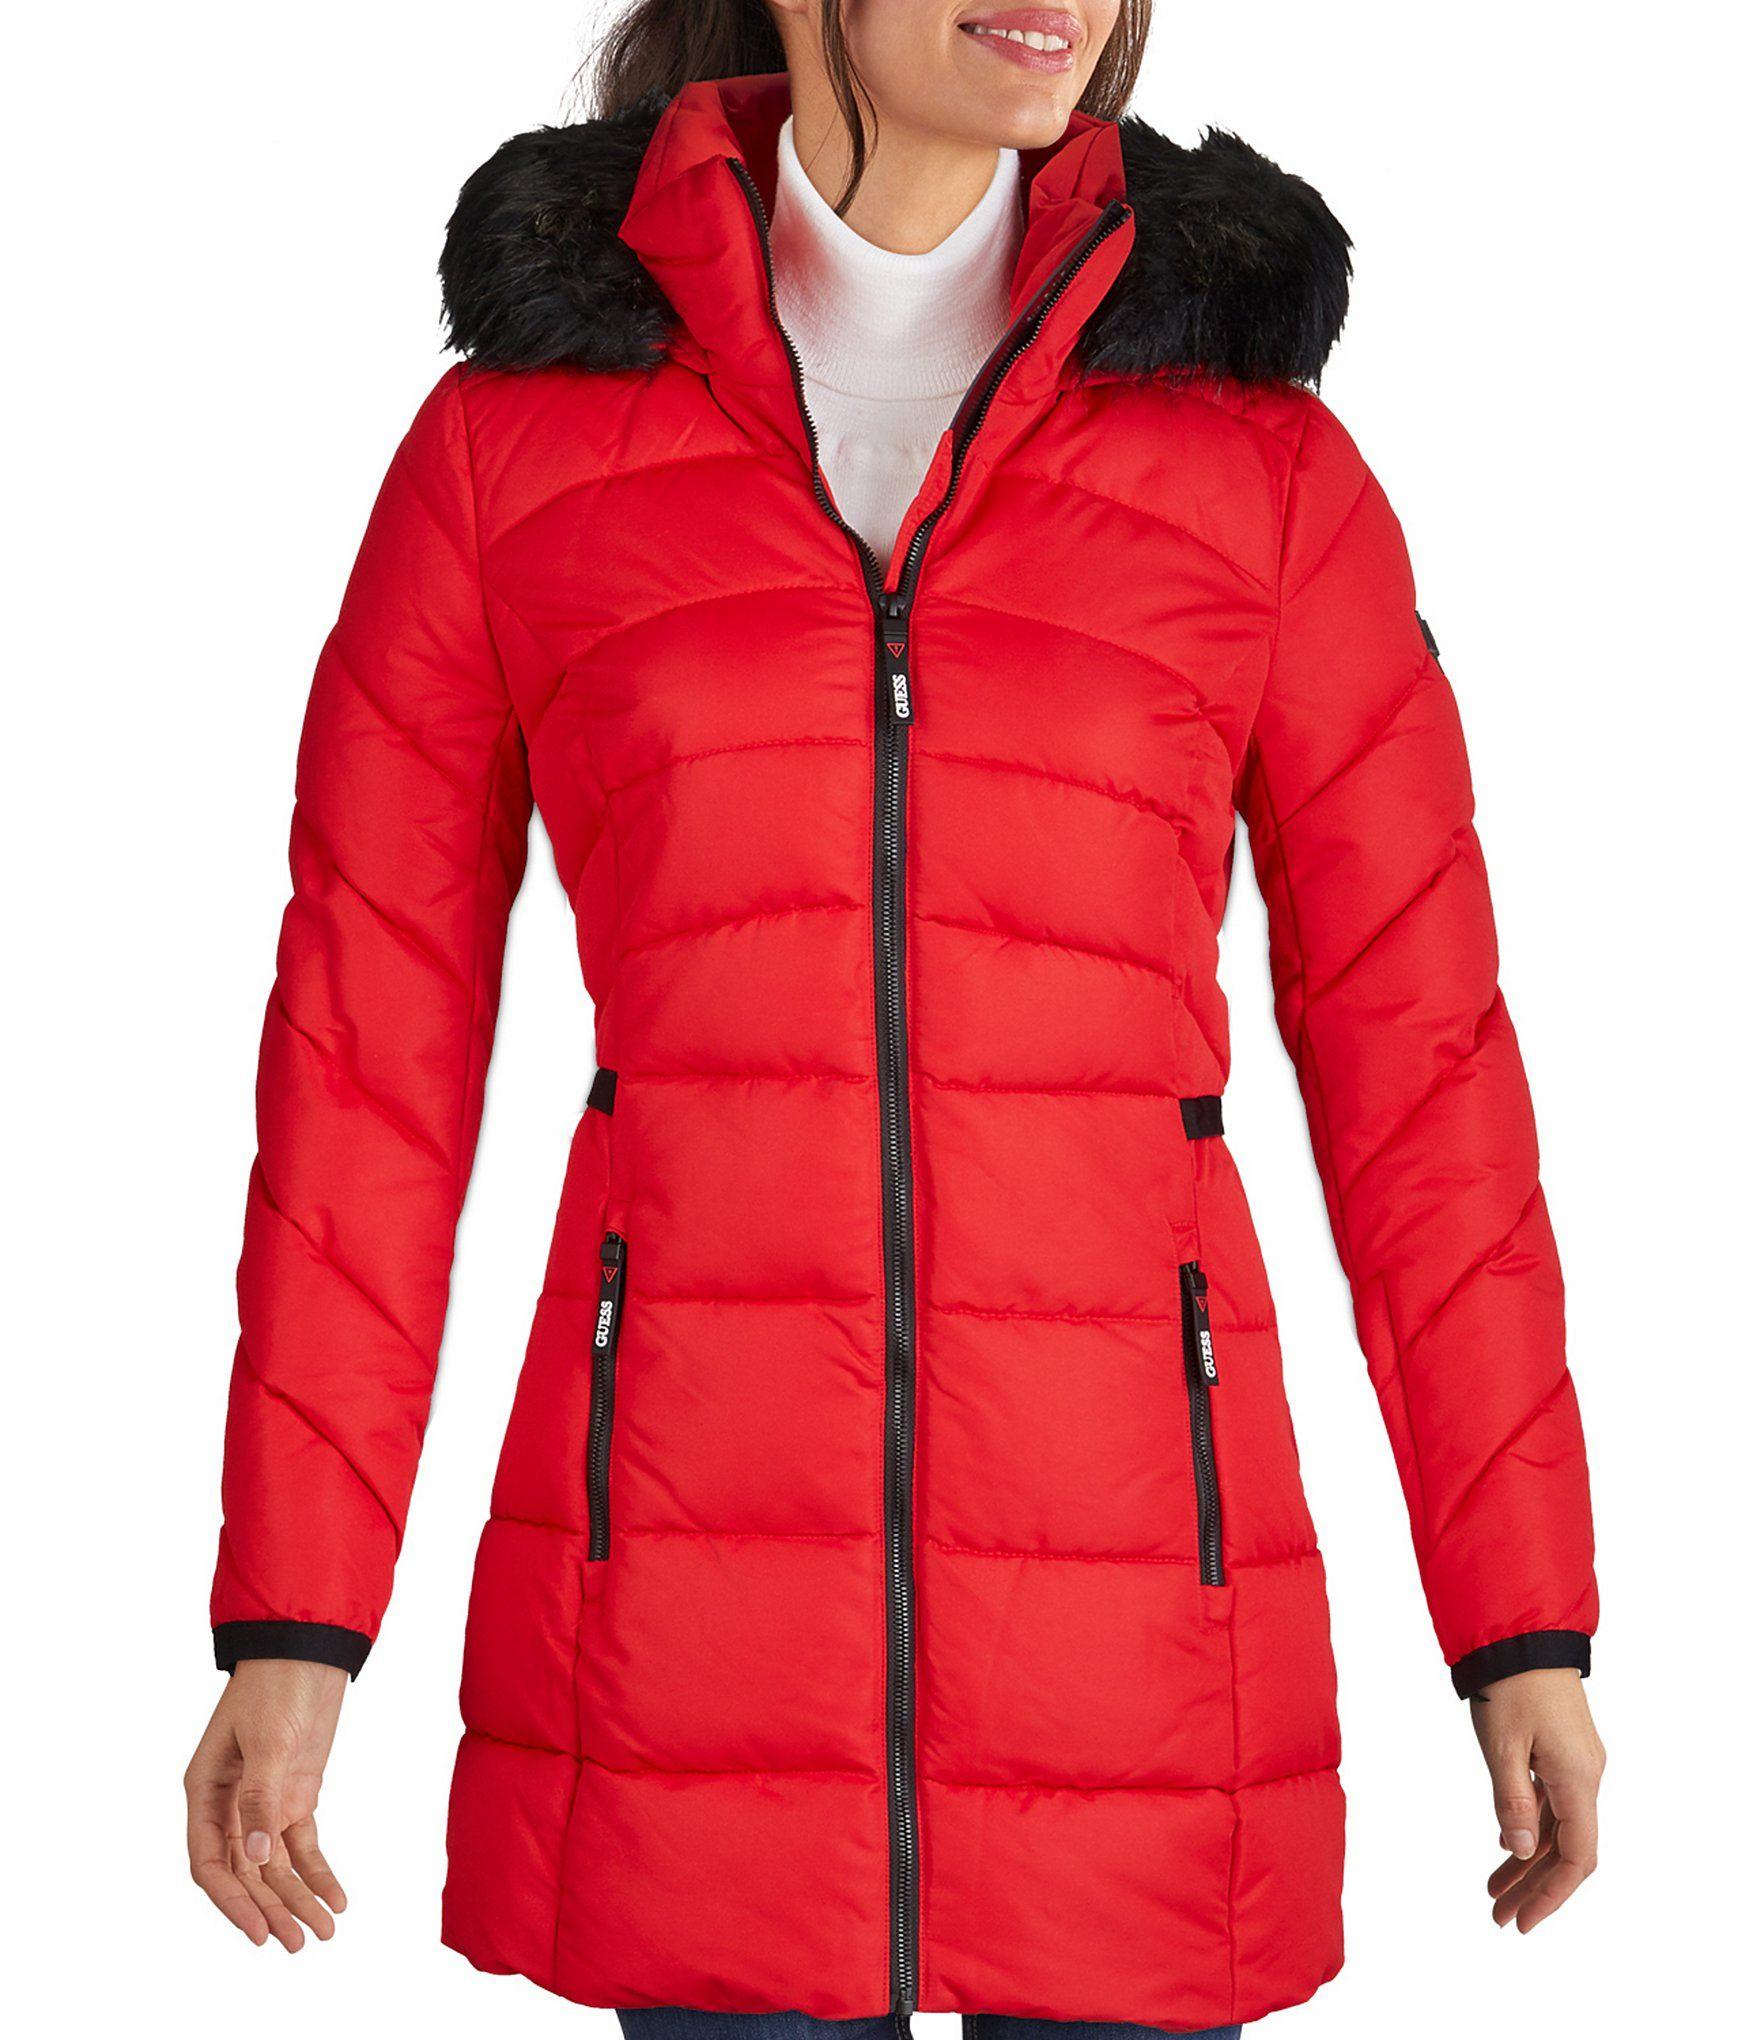 Guess Zip Front Puffer Anorak Down Coat With Removable Faux Fur Trimmed Hood Dillard S Anorak Down Coat Fur Trim [ 2040 x 1760 Pixel ]